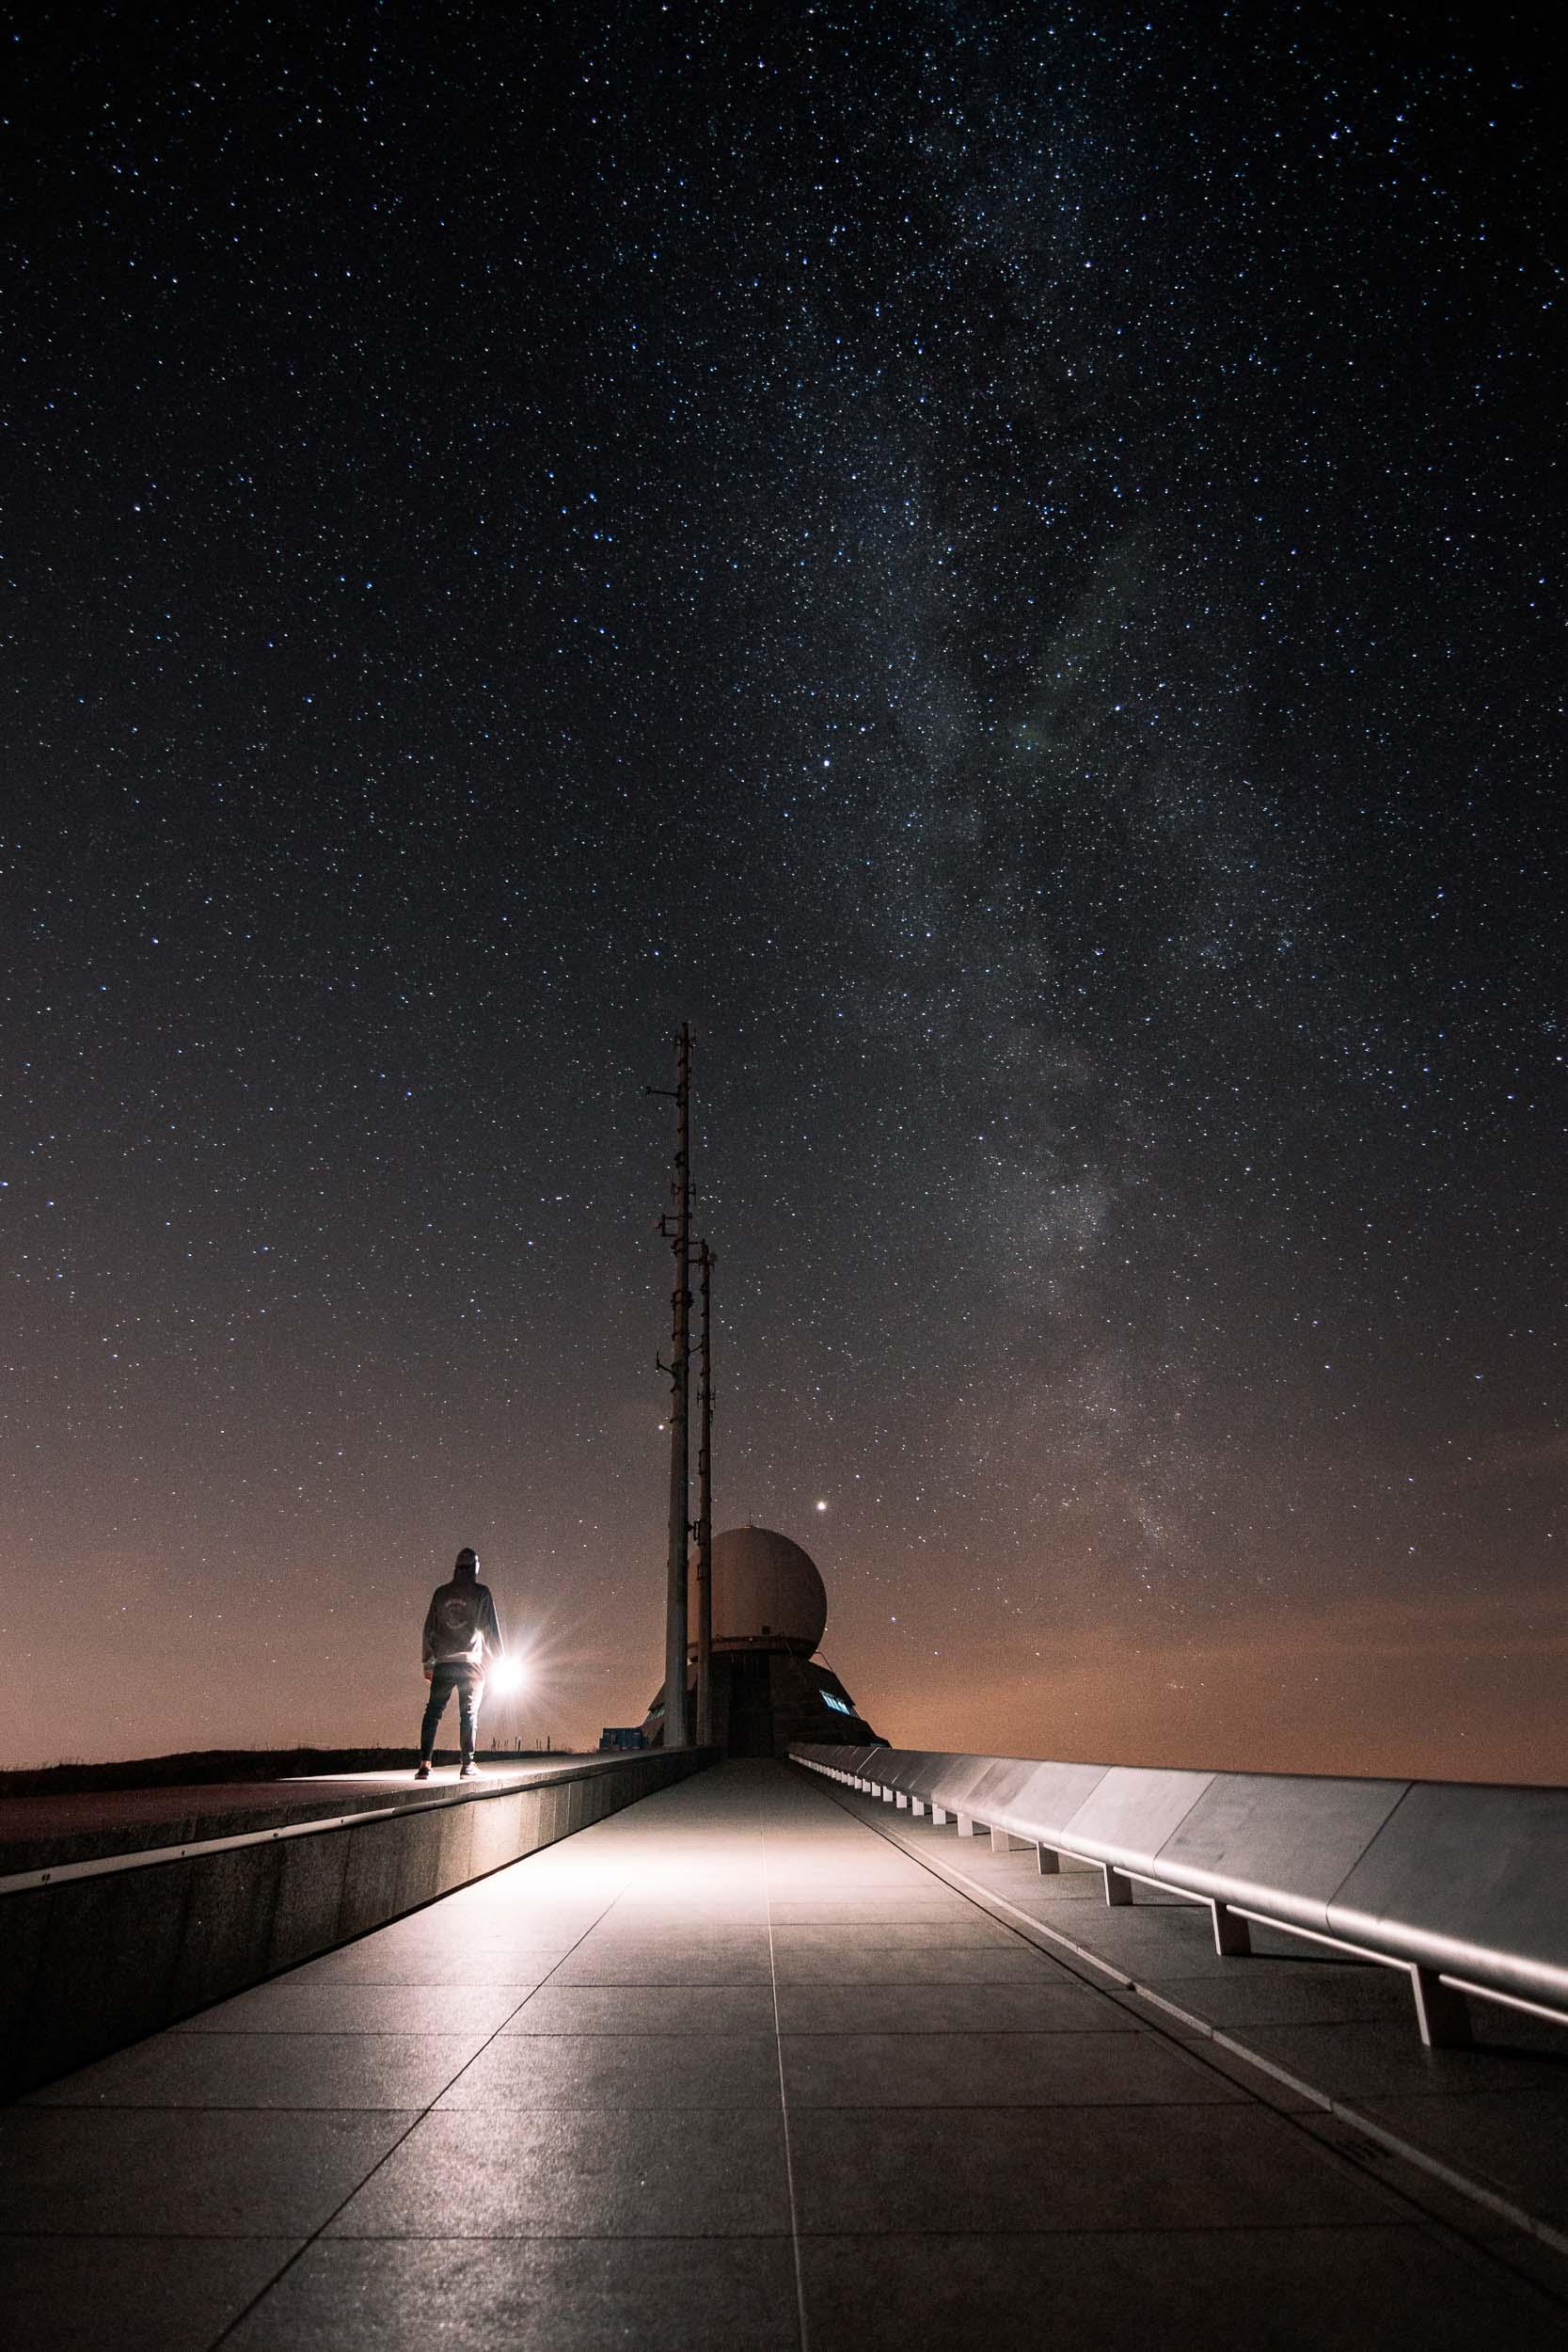 Voyage-astrophoto-gui2raw-photographe-alsace-voielactée-legrandballon